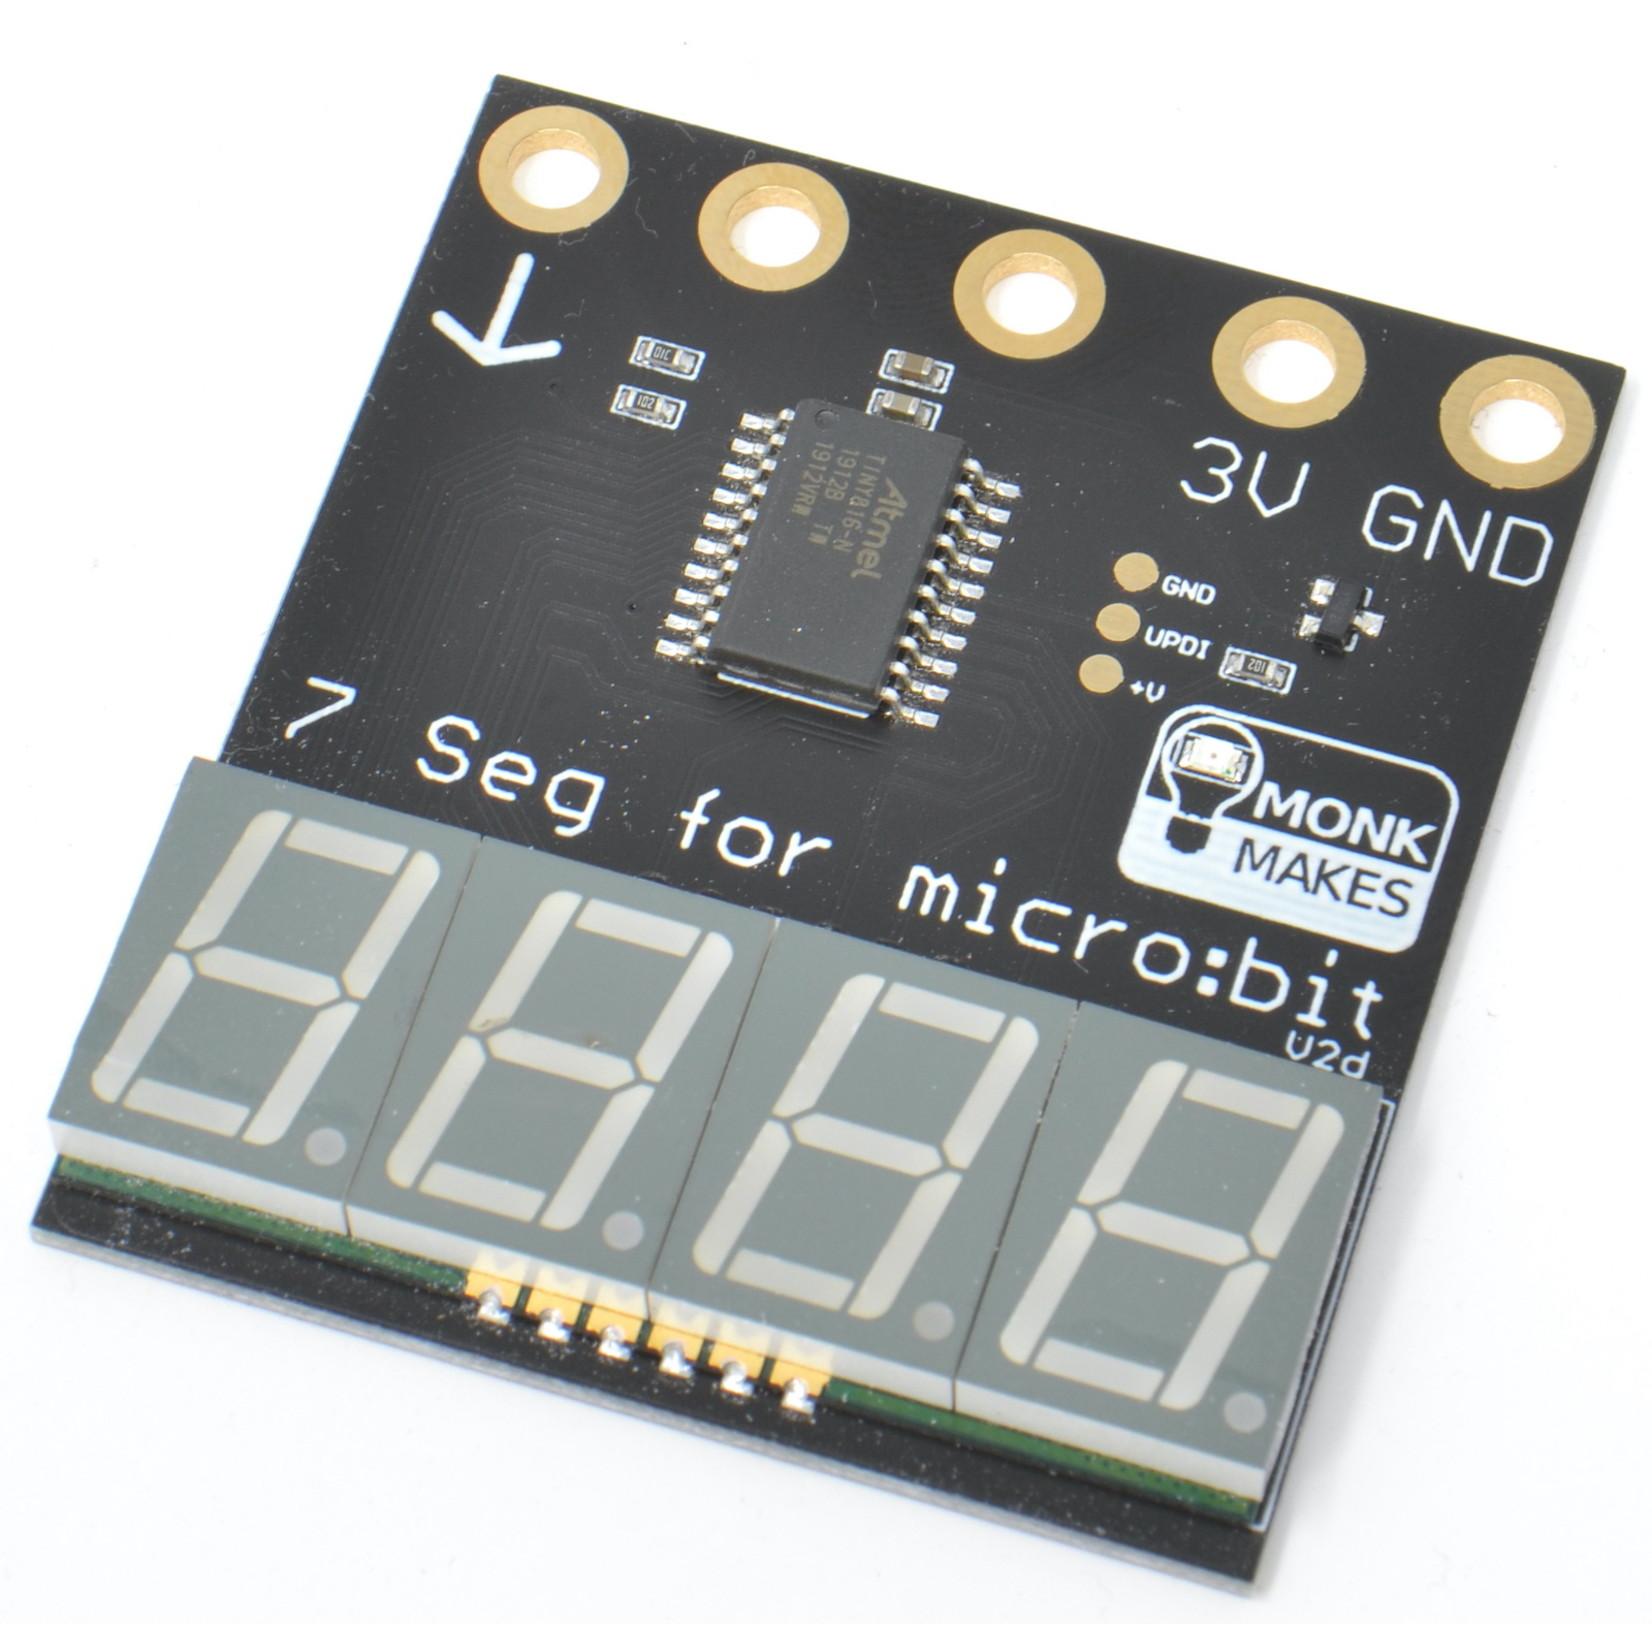 MonkMakes 7-segment for micro:bit